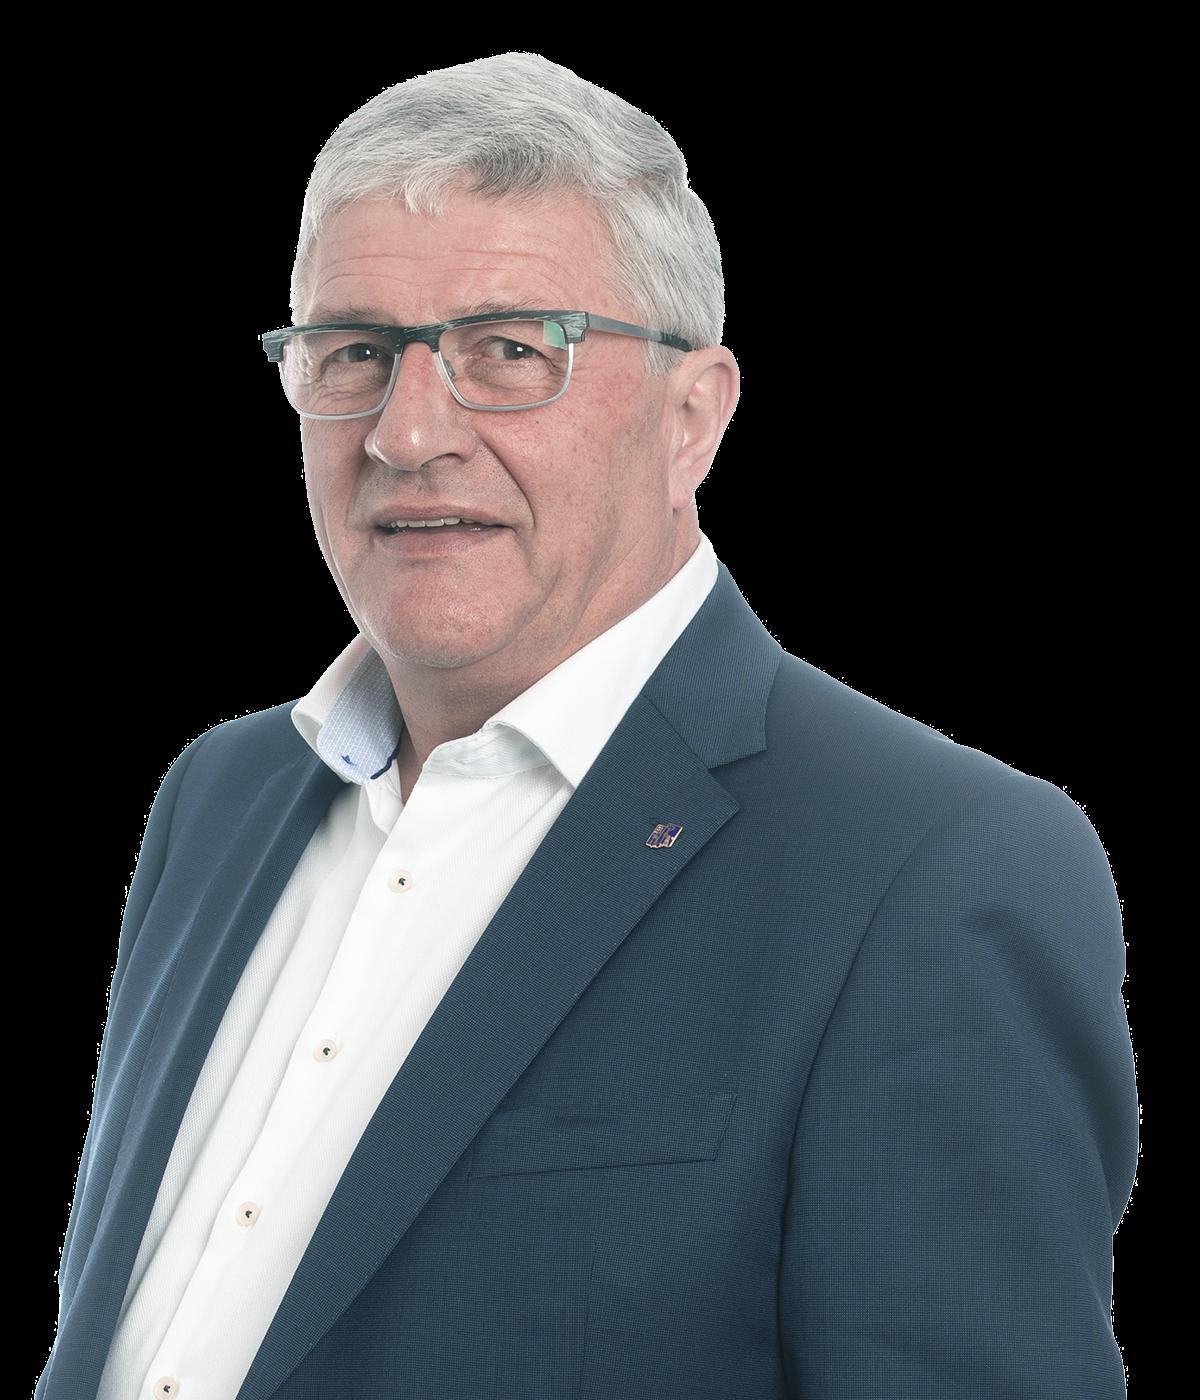 Jean-pierre Taverniers